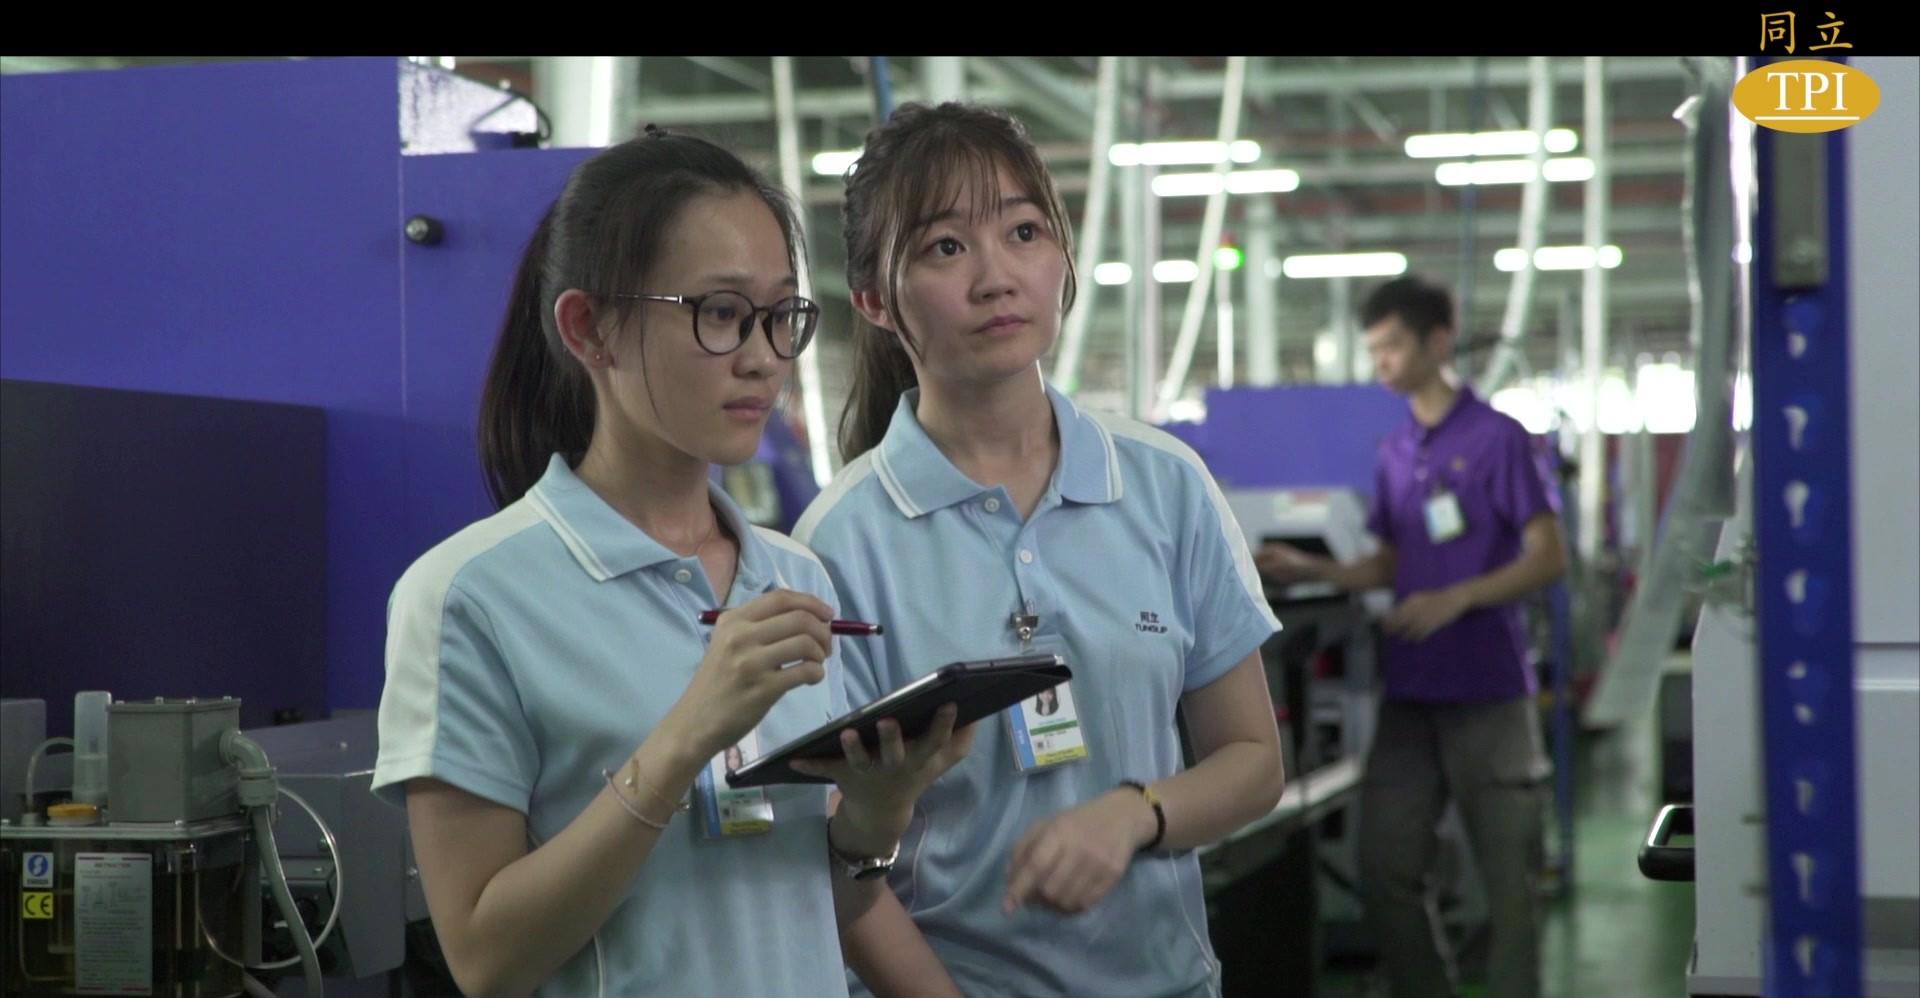 Lean Manufacturer